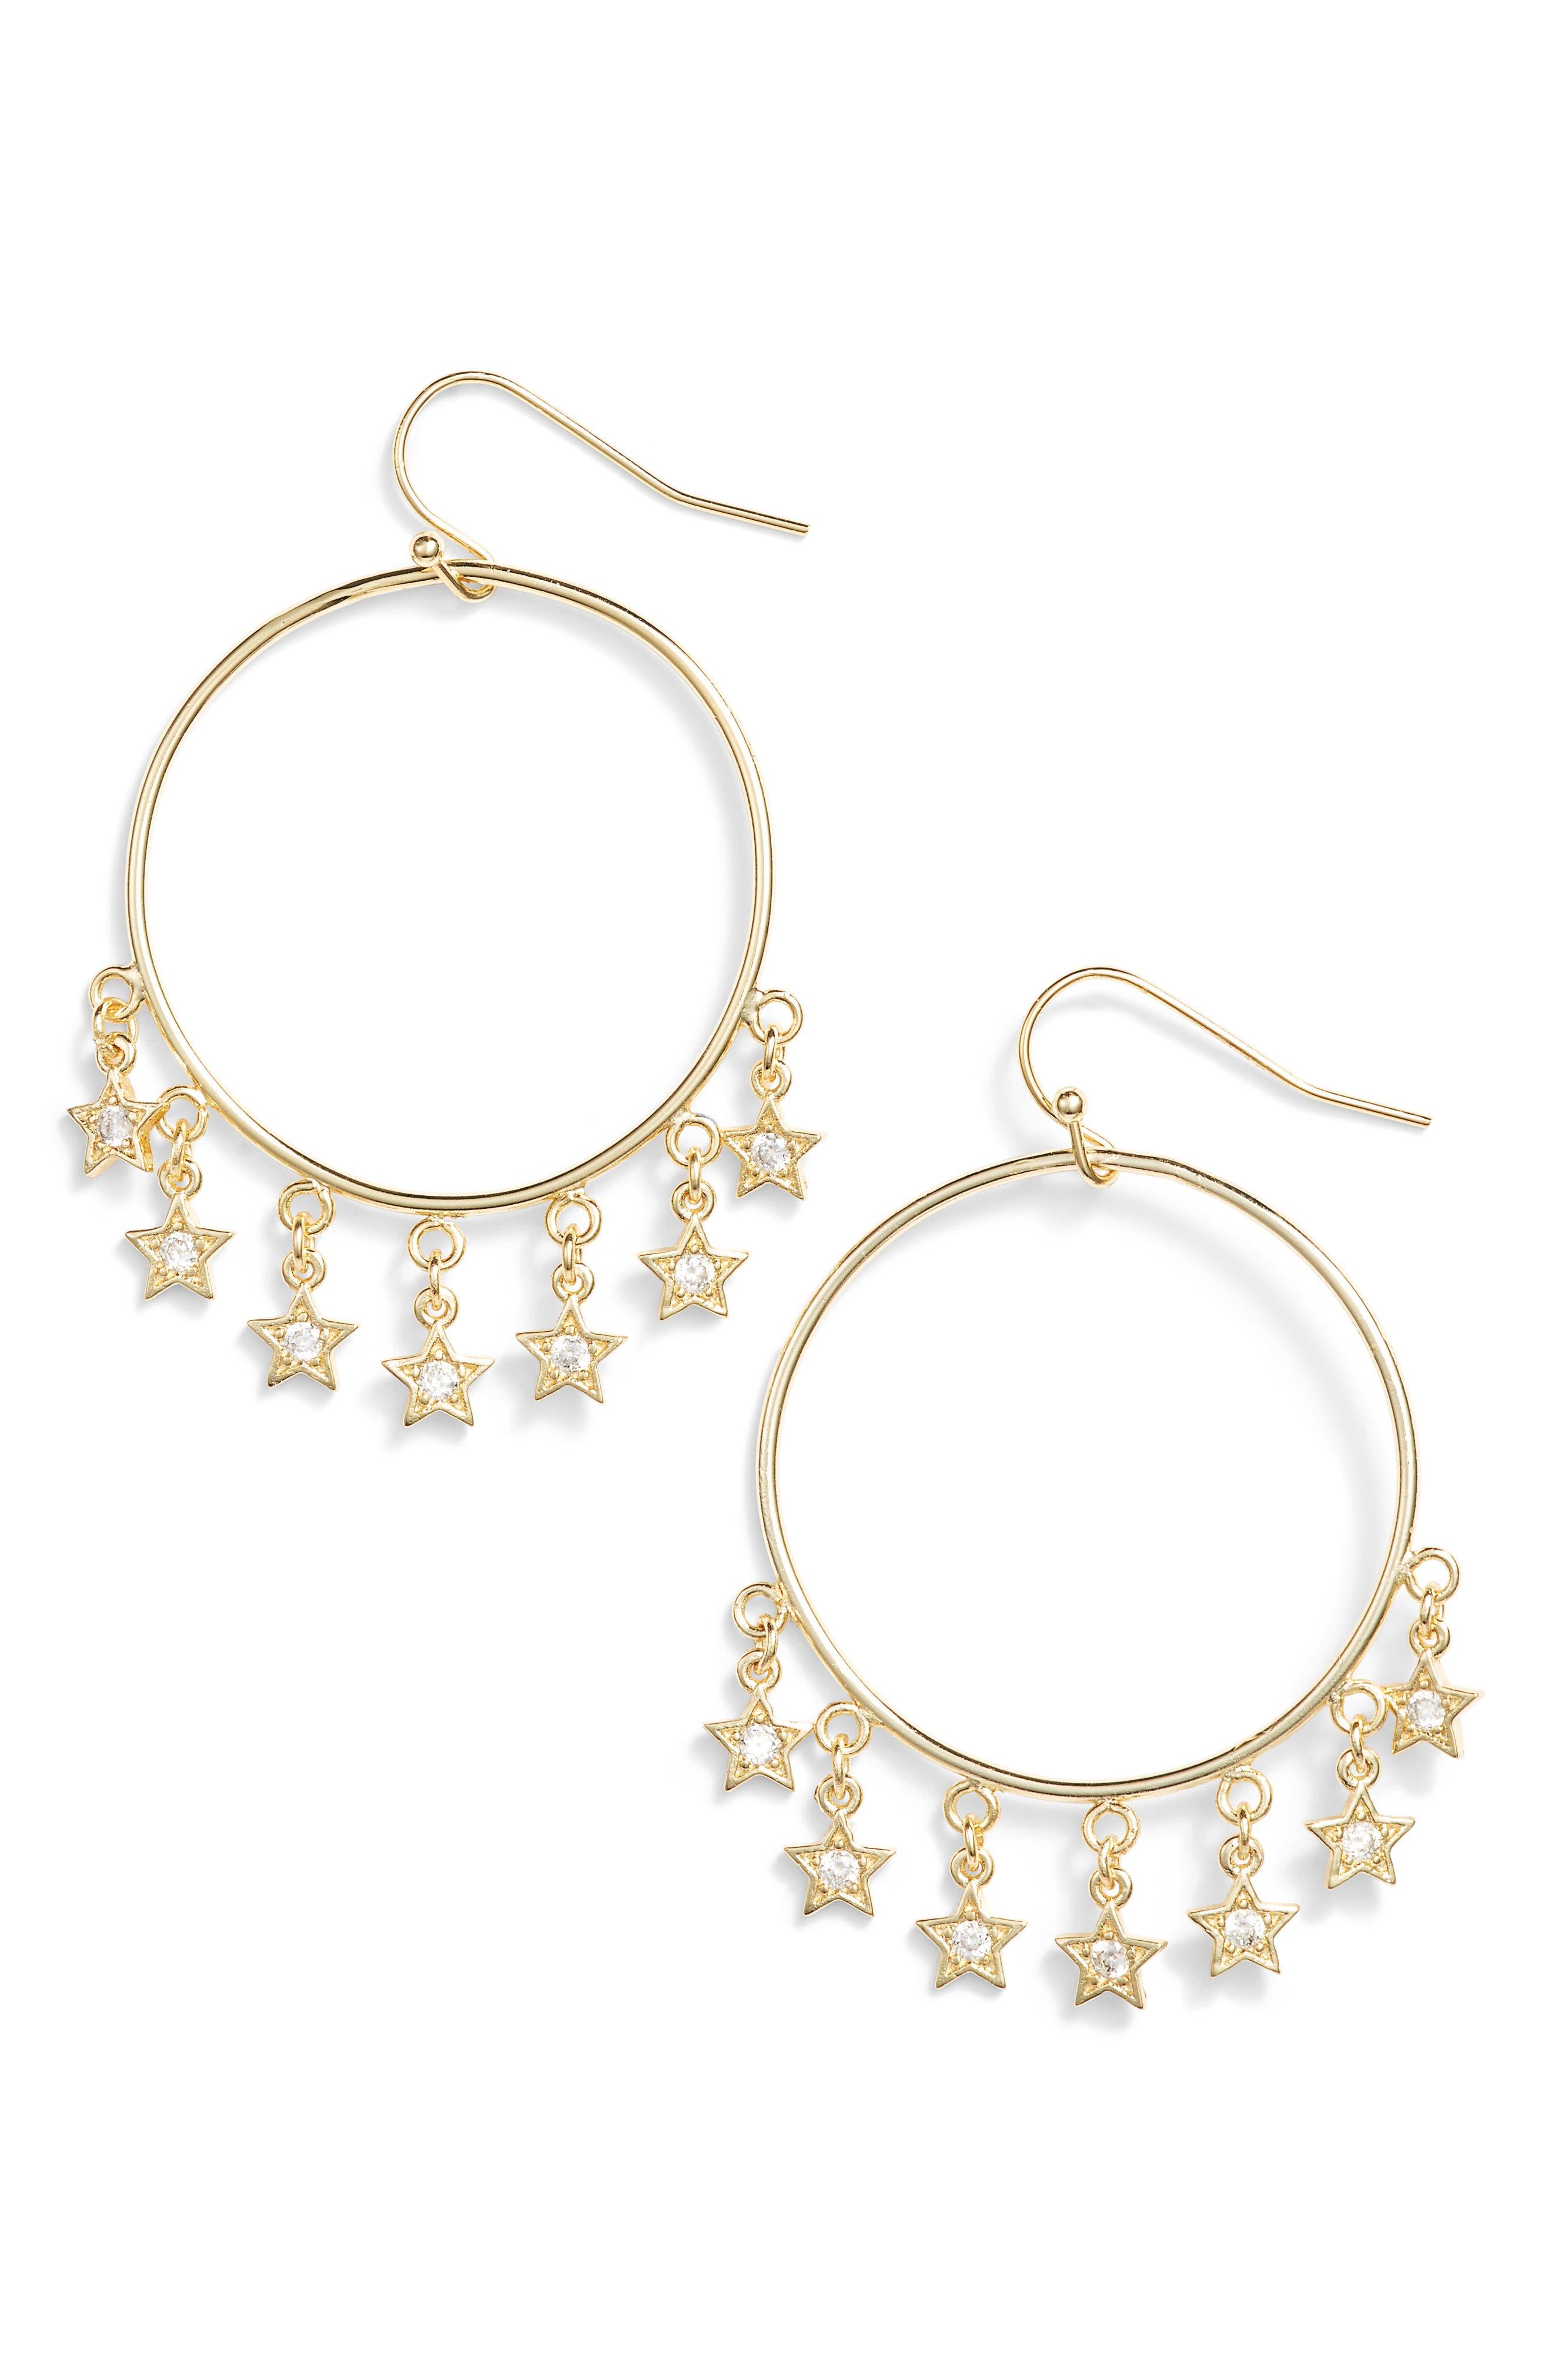 Star Shooter Hoop Earrings,                         Main,                         color, Cz/ Gold